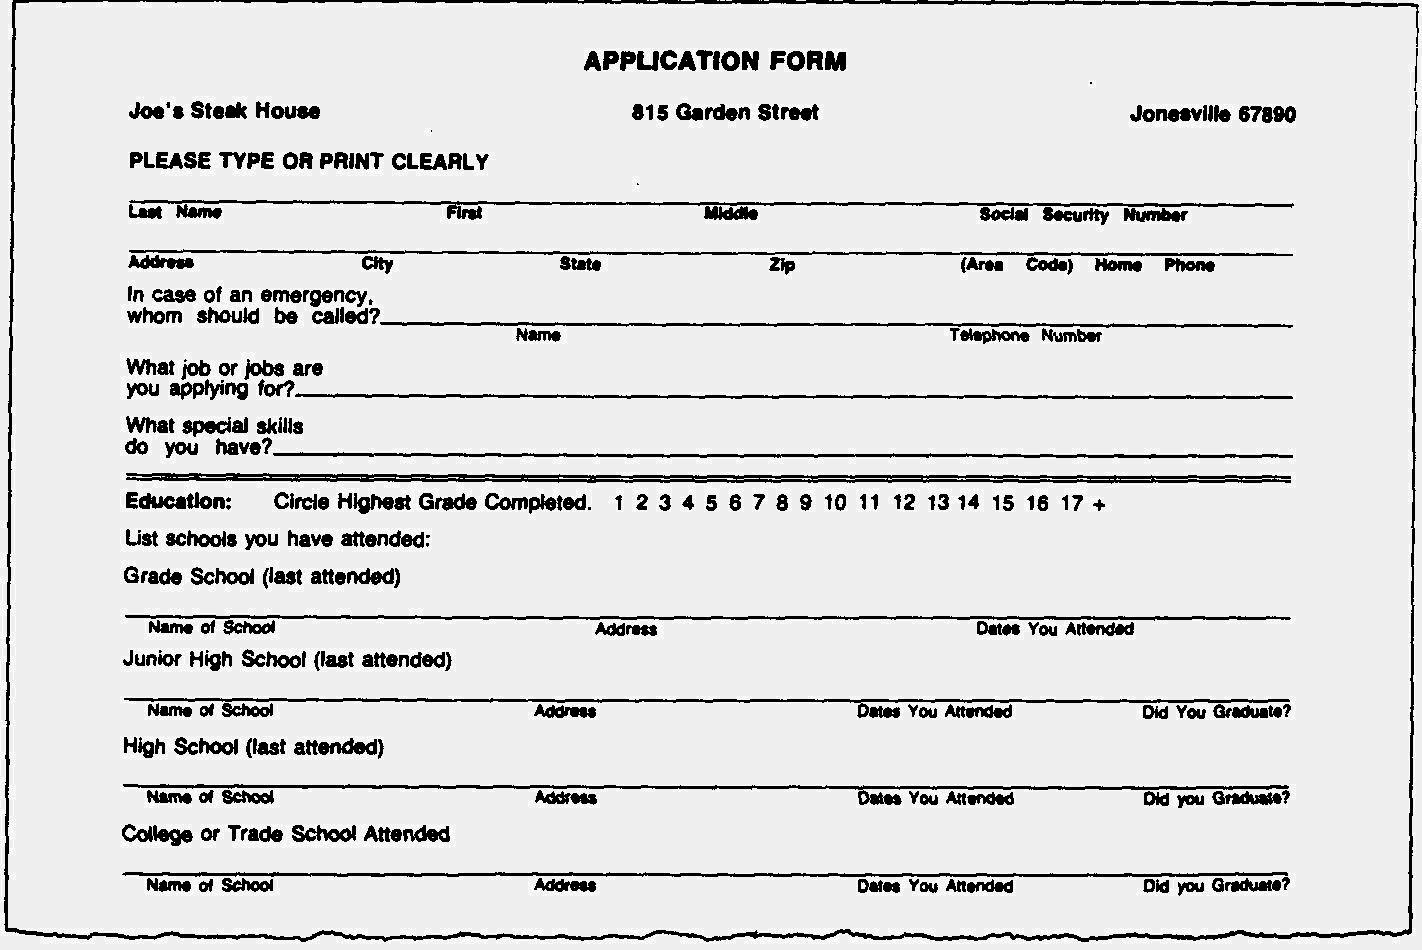 resume format blank page printable editable blank 2017 cd15b8215f9226cf726e4bdf8bea164f resume format blank page